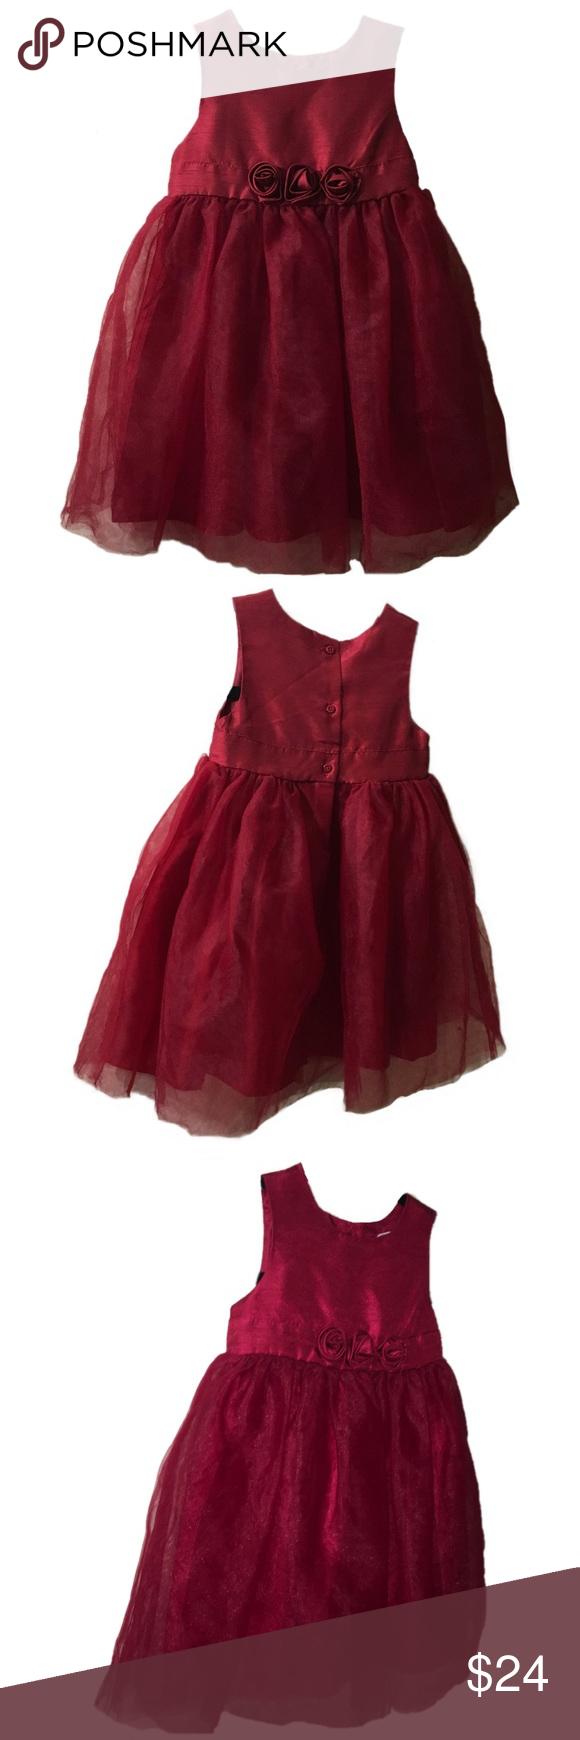 38f8a2b84 Gymboree Baby Girls Red Christmas Dress 18-24m Beautiful Holiday dress by  Gymboree! Classic